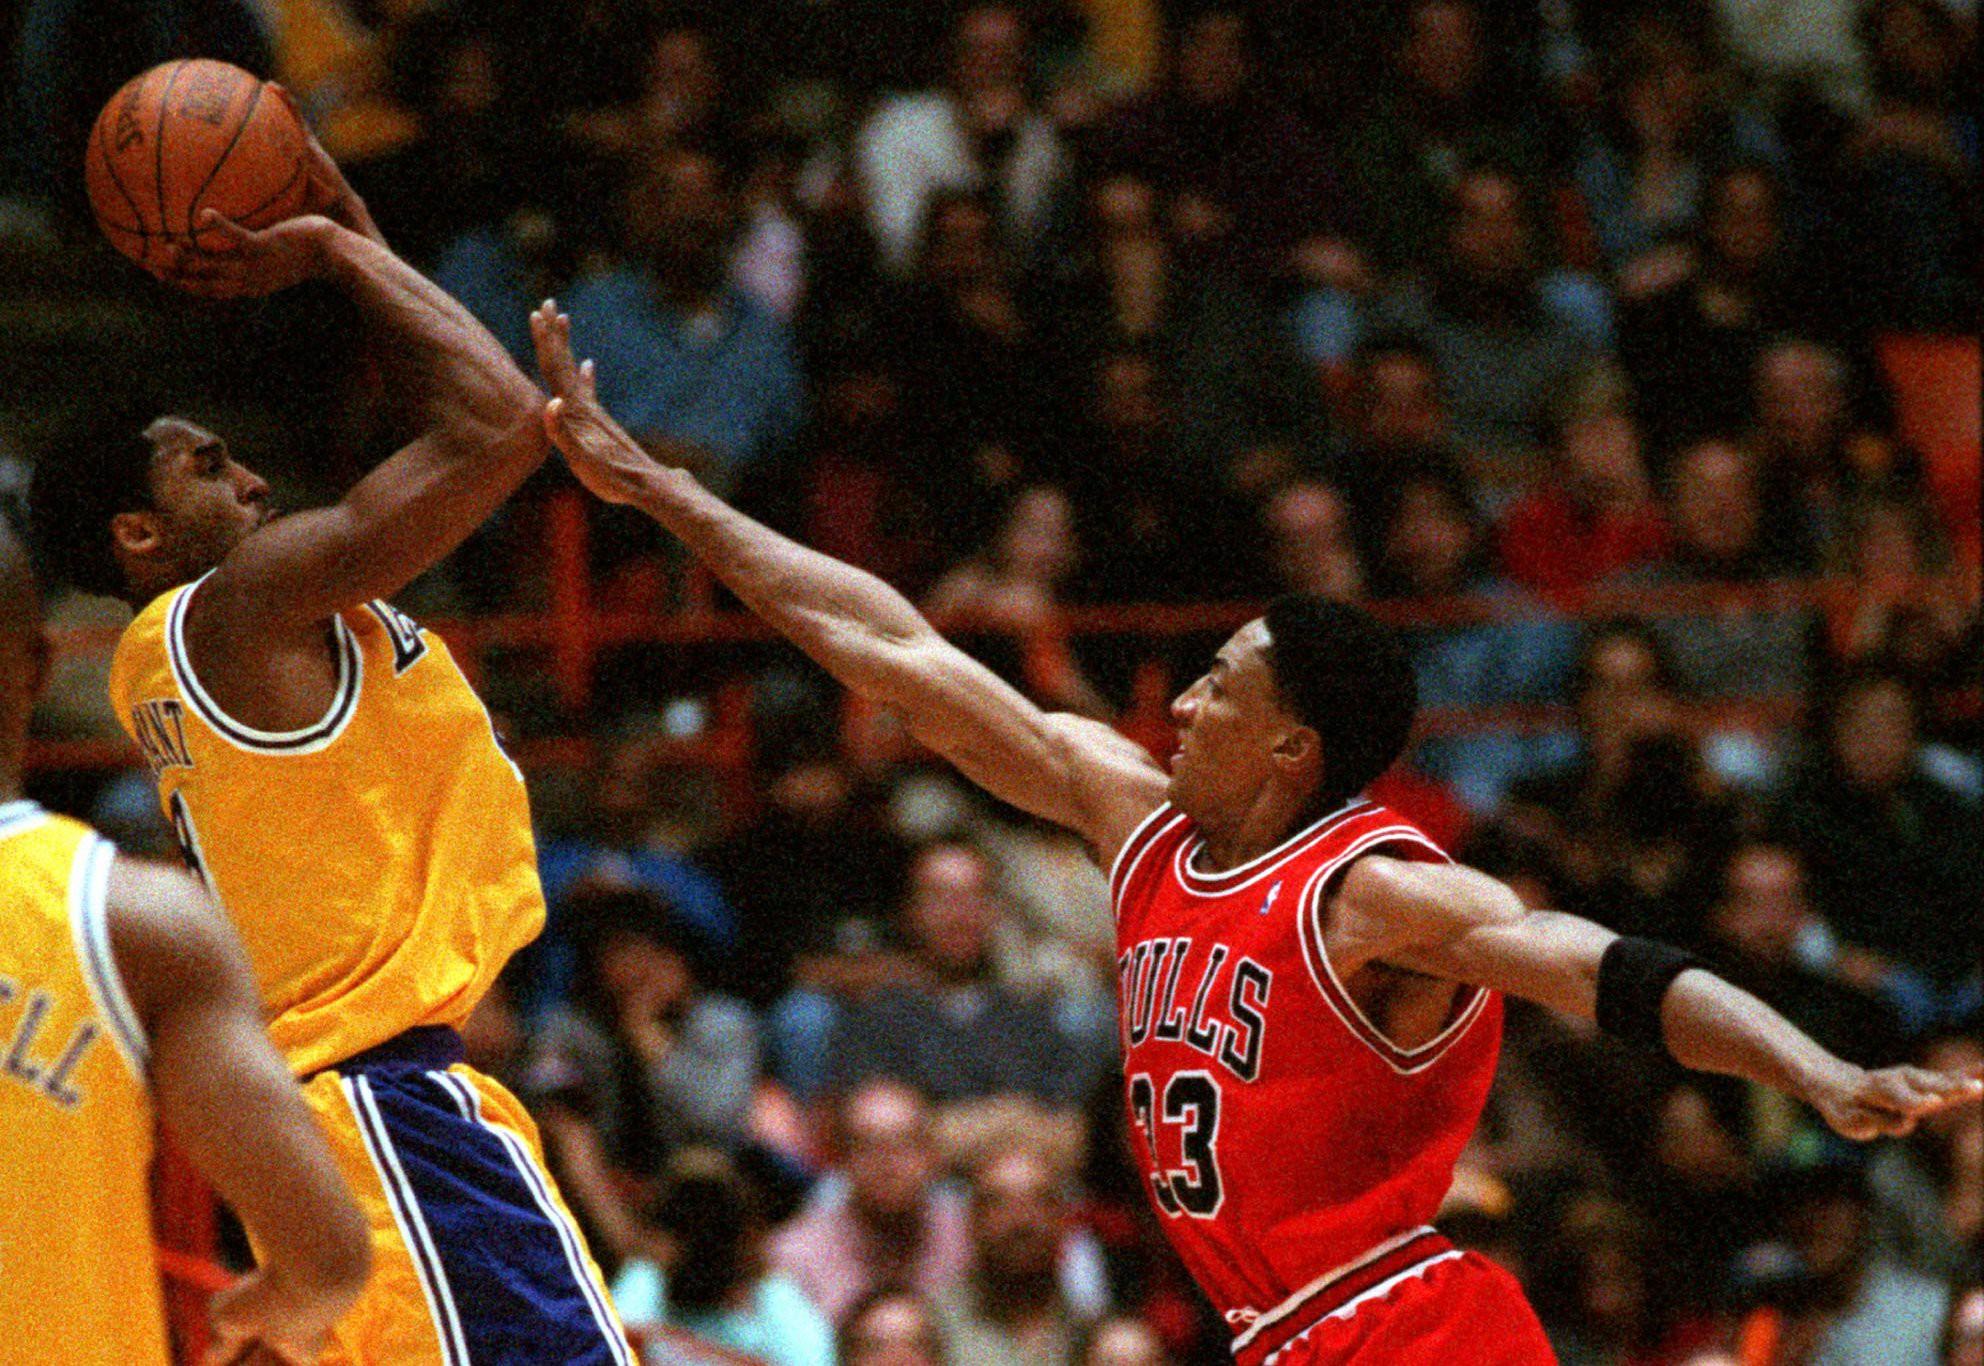 Kobe Bryant and Scottie Pippen